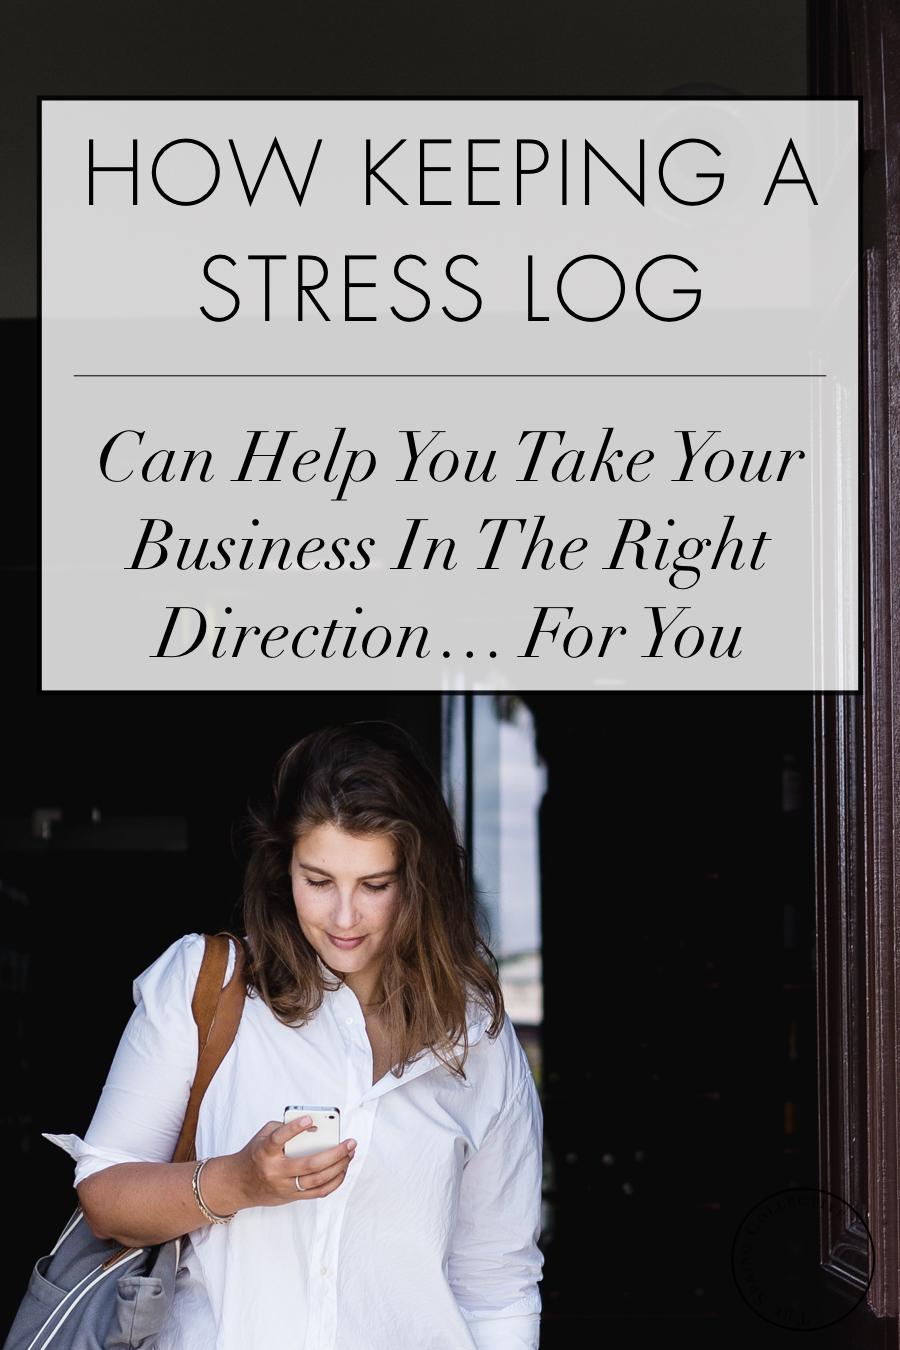 keeping-a-stress-log.jpg